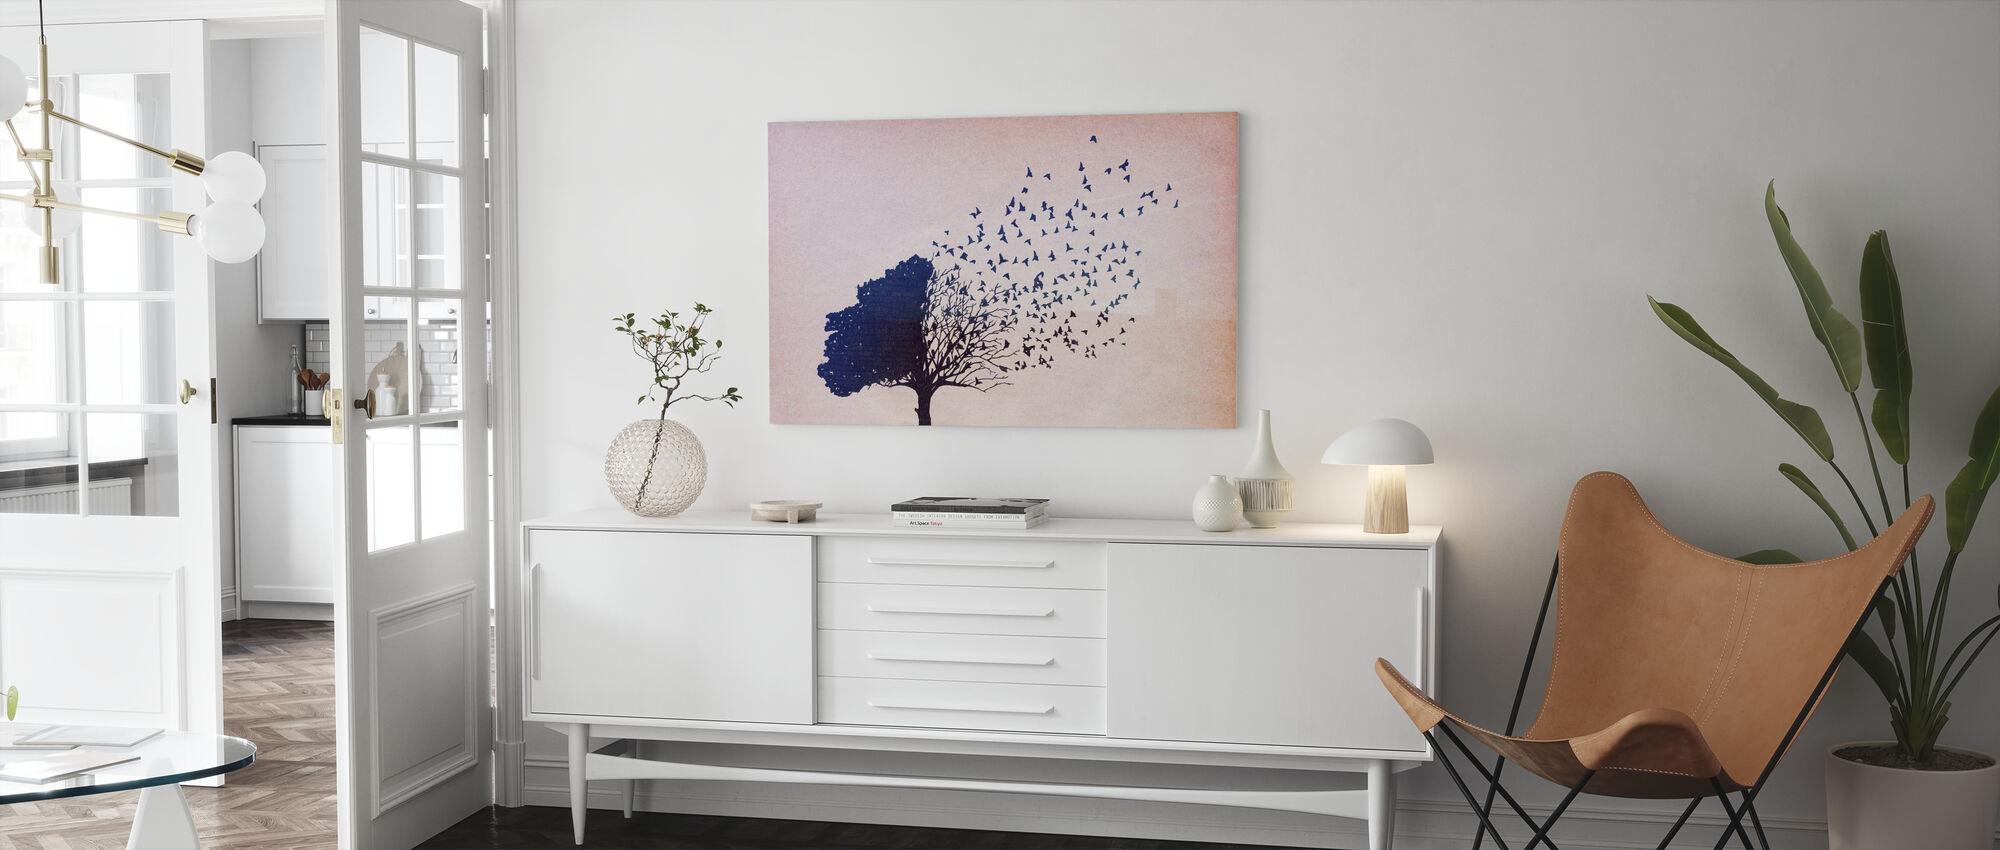 Fåglar Blad - Canvastavla - Vardagsrum